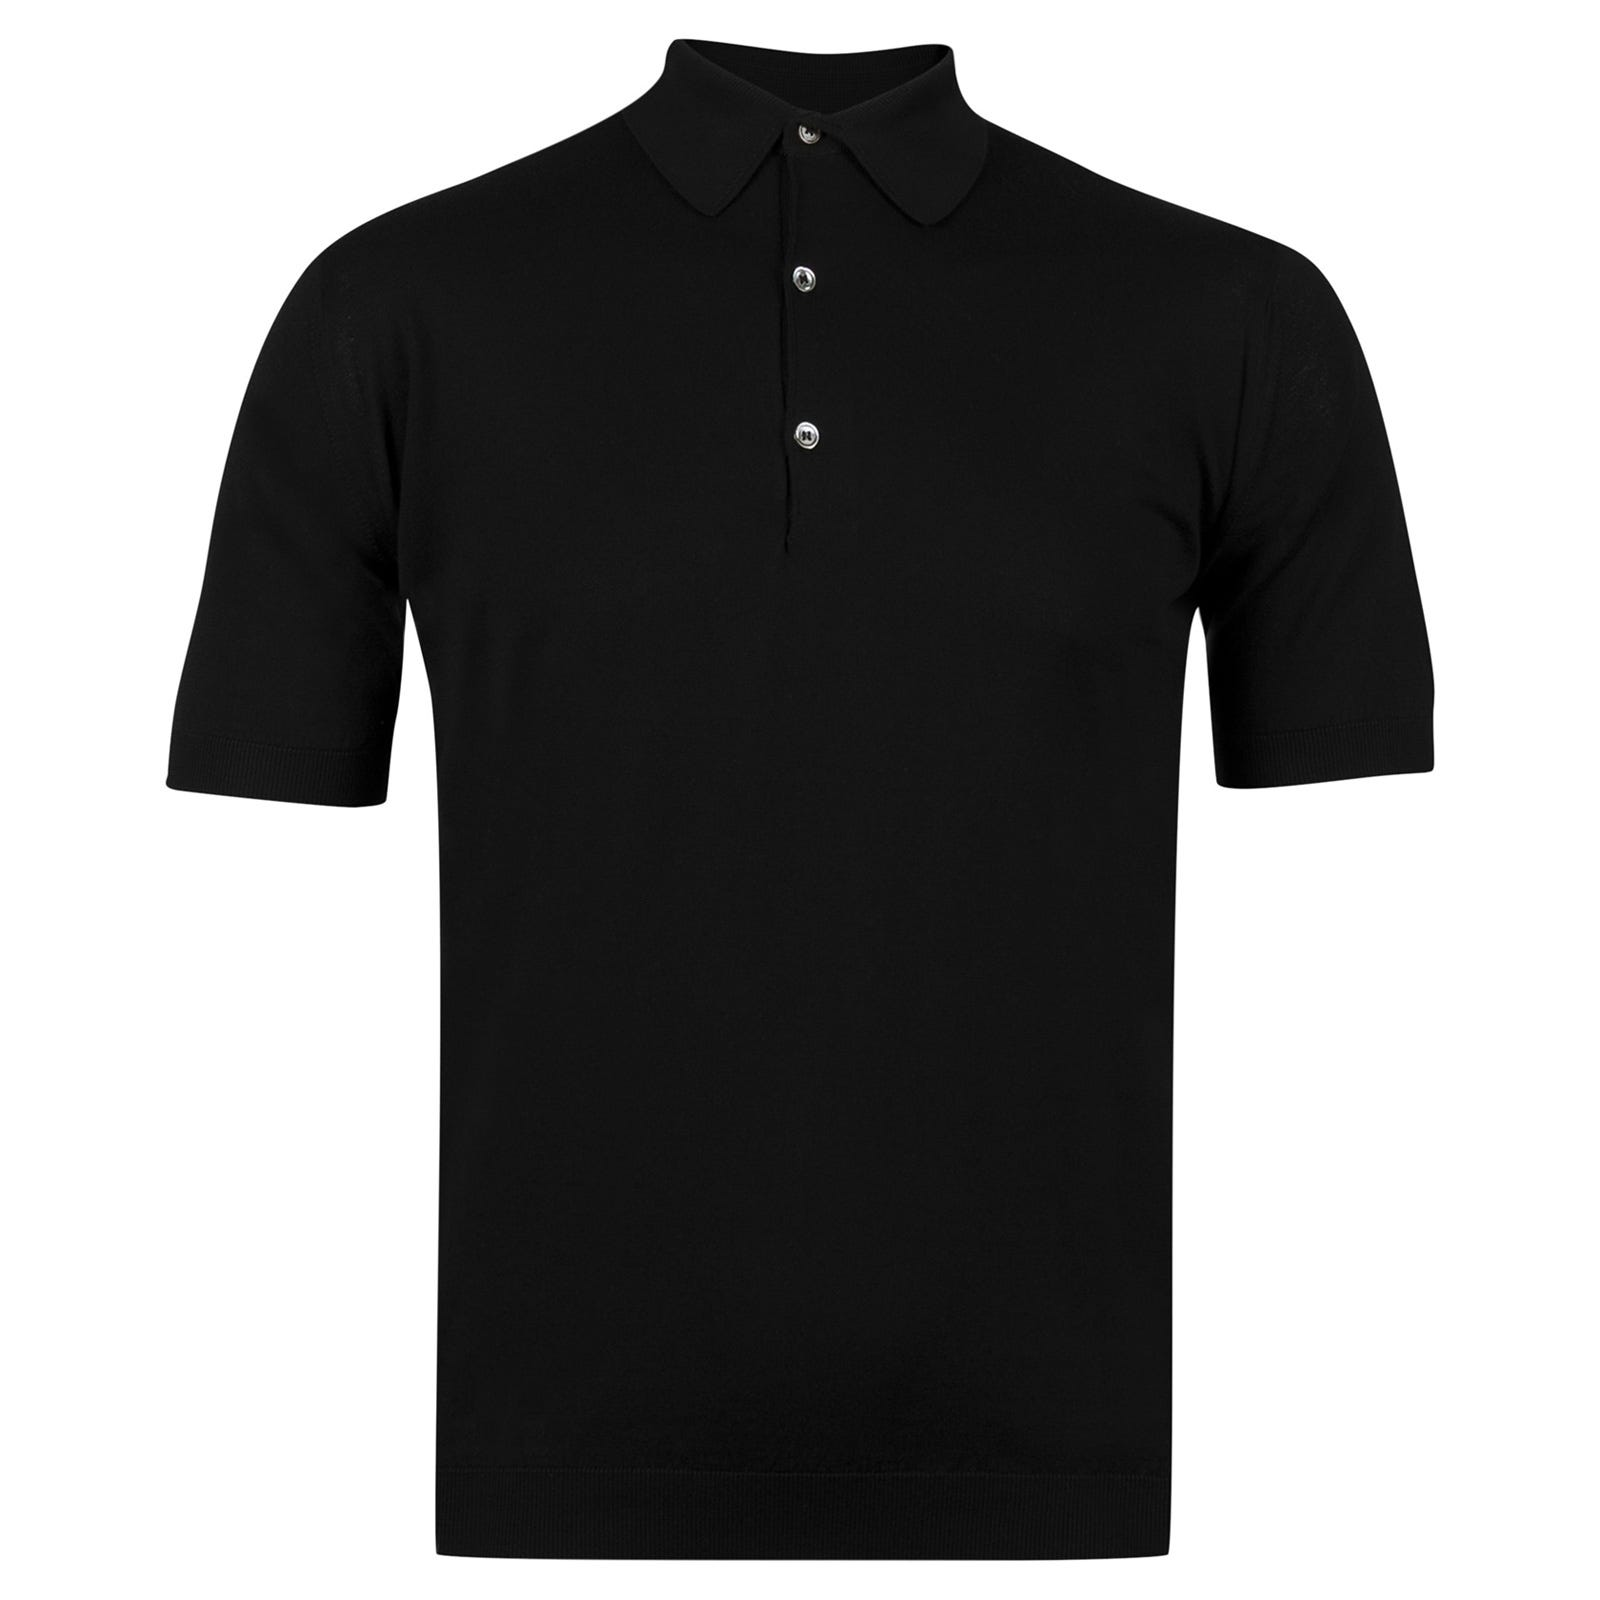 John Smedley adrian Sea Island Cotton Shirt in Black-L